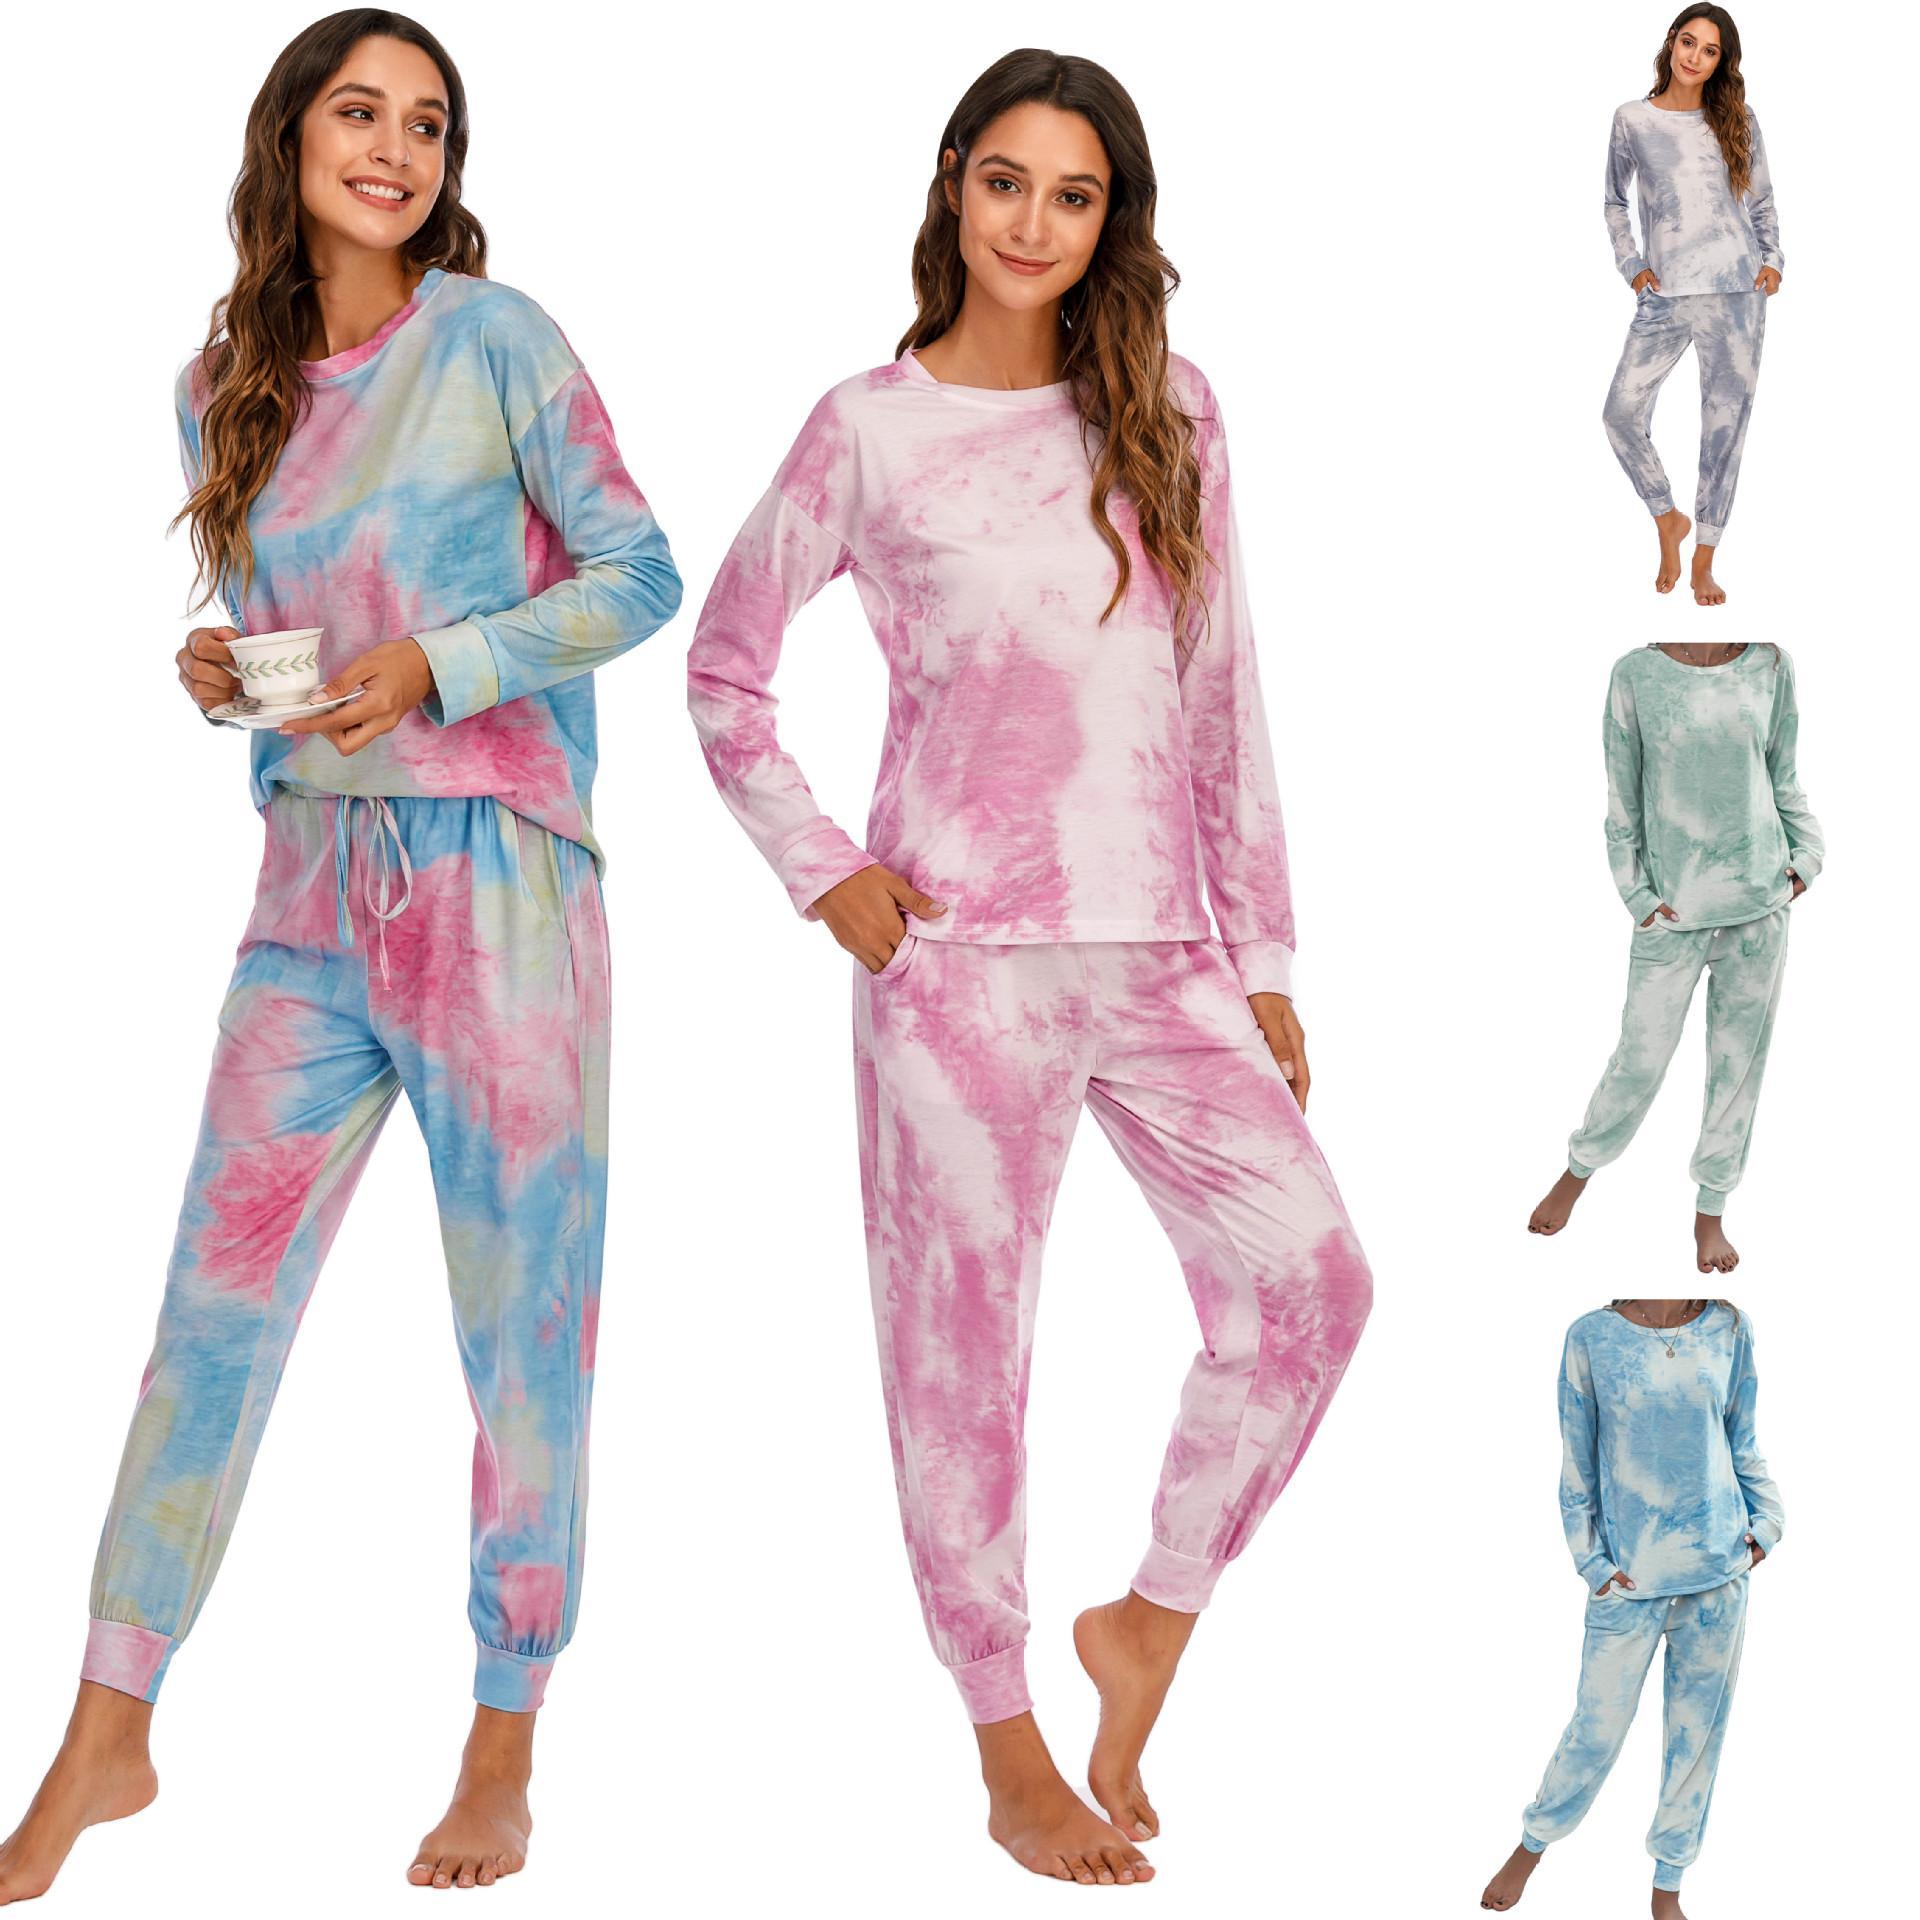 Femmes Pajamas Set Tie Colory Pyjamas Pyjamas Lount Wear Homewear Costume Loungewear Set Femmes Sleep Wear Pyjamas pour femmes LLS147